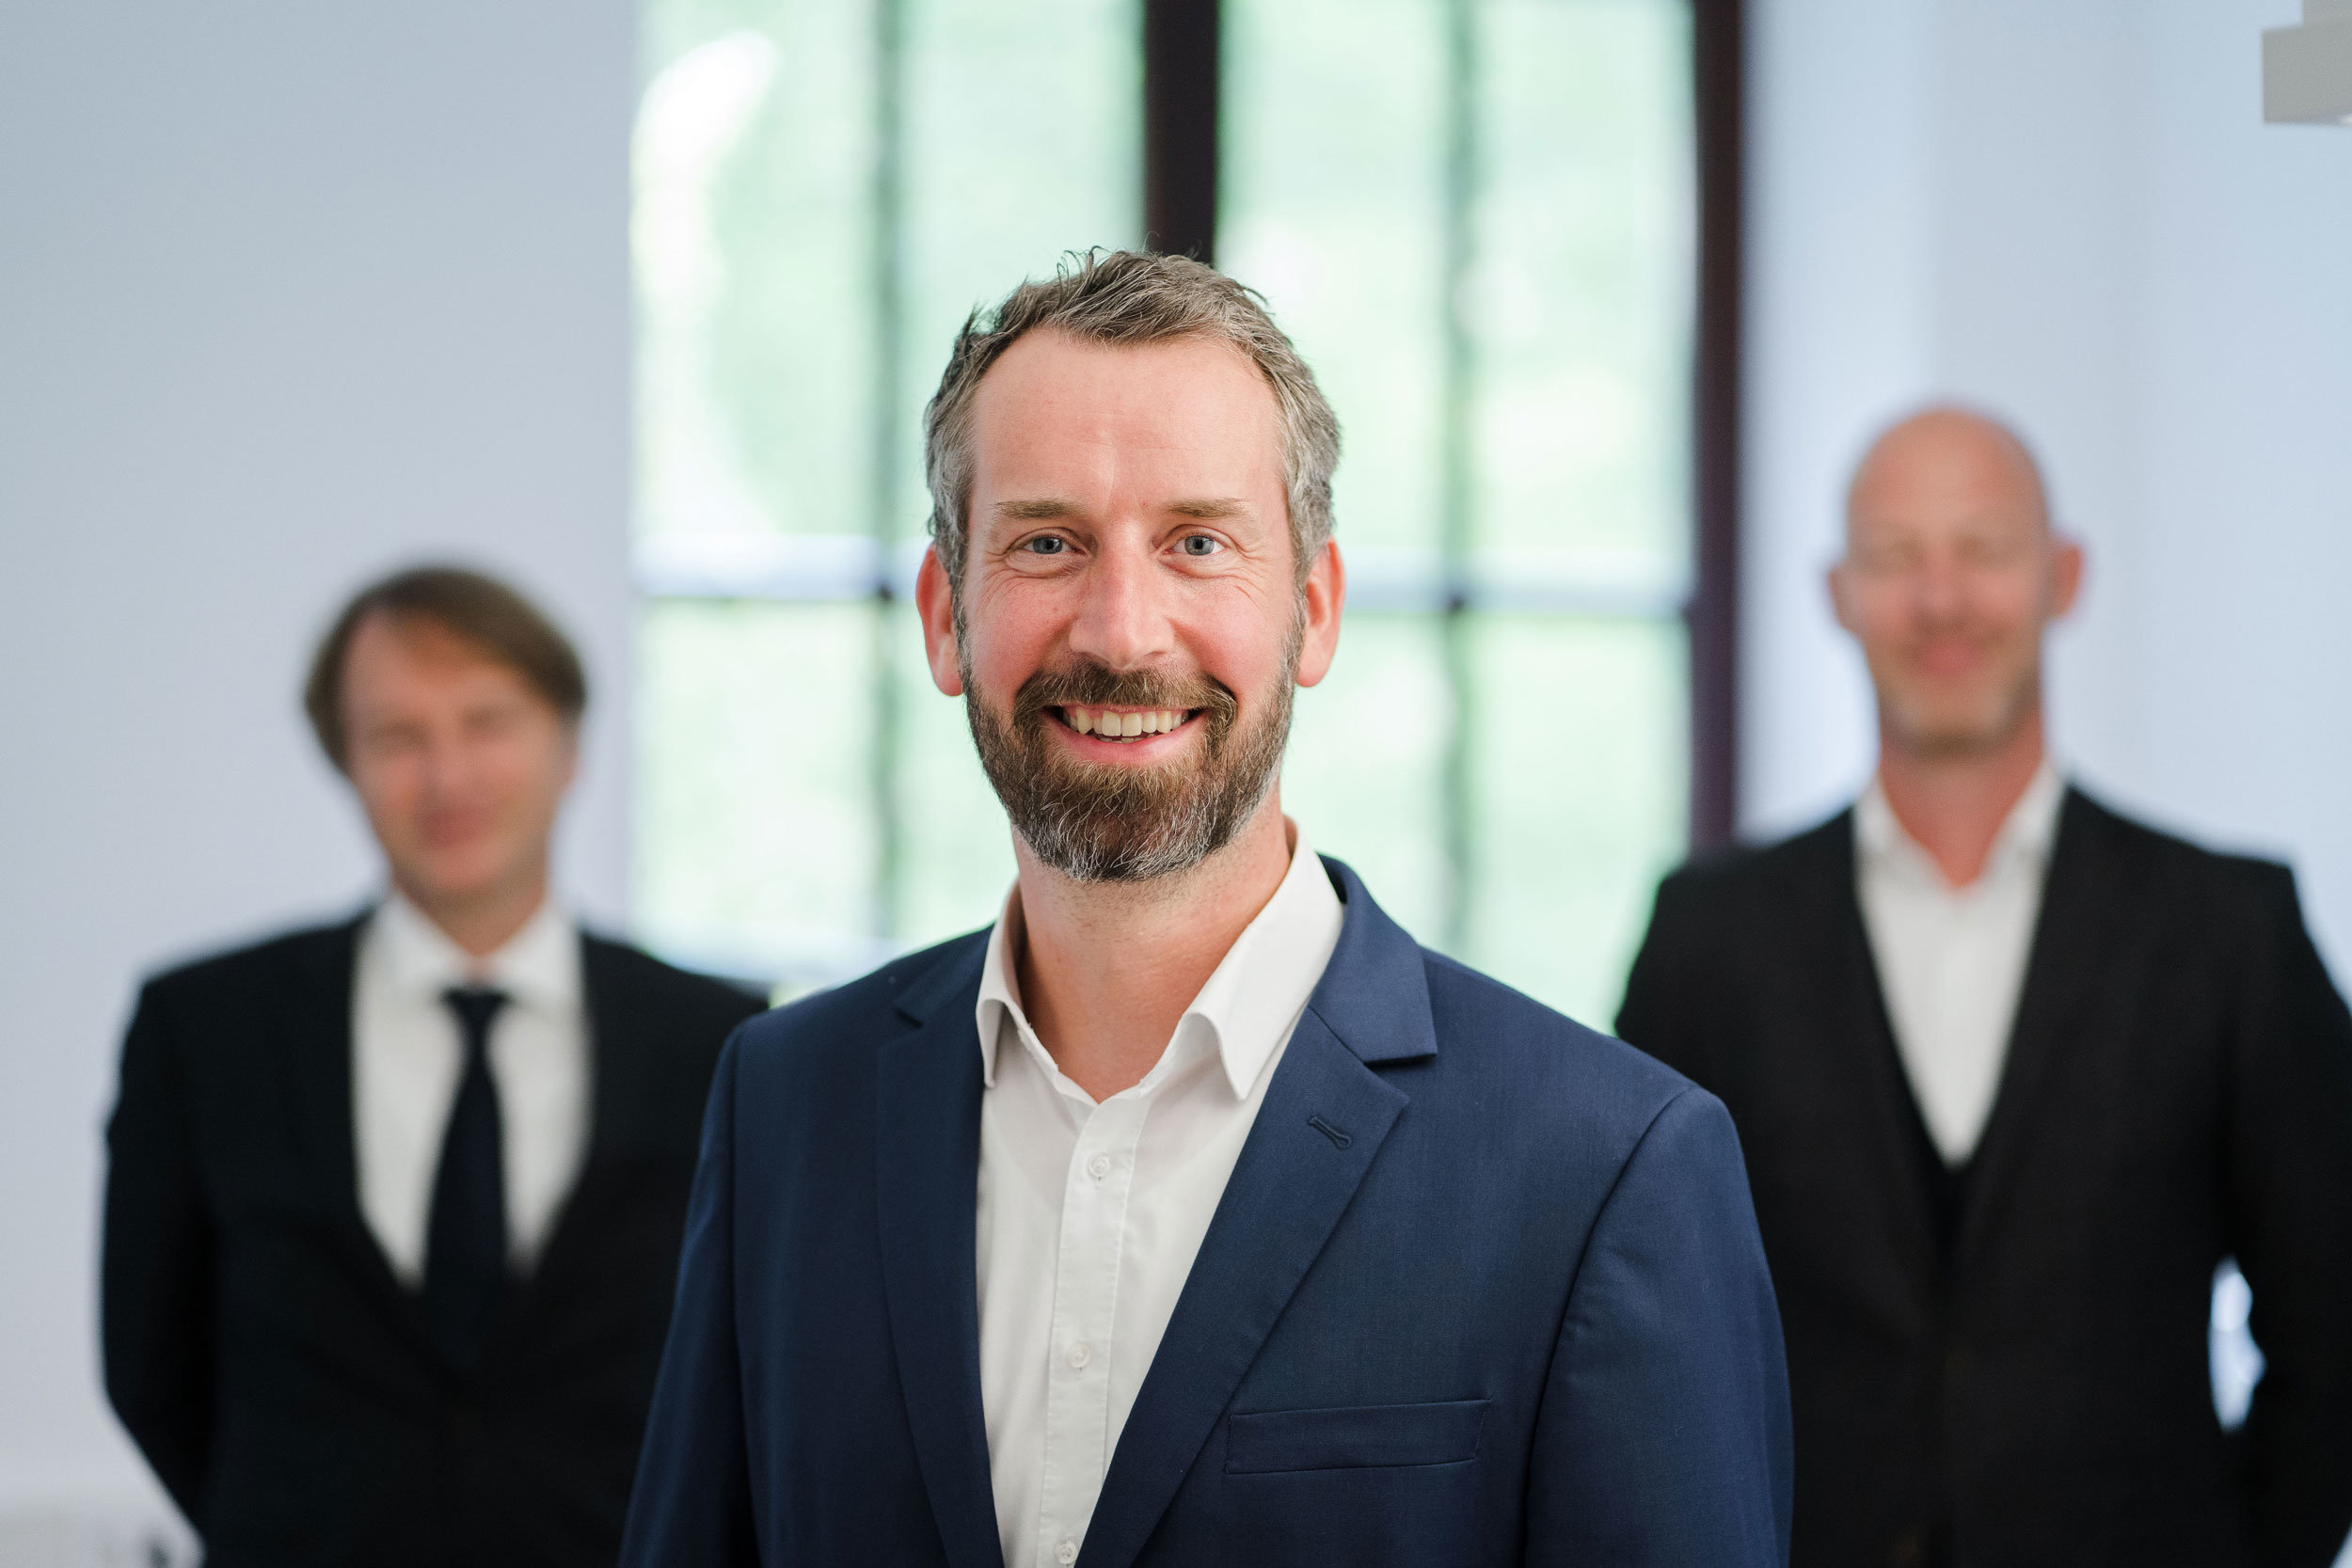 Rechtsanwalt für Arbeitsrecht in München | Torsten Klose